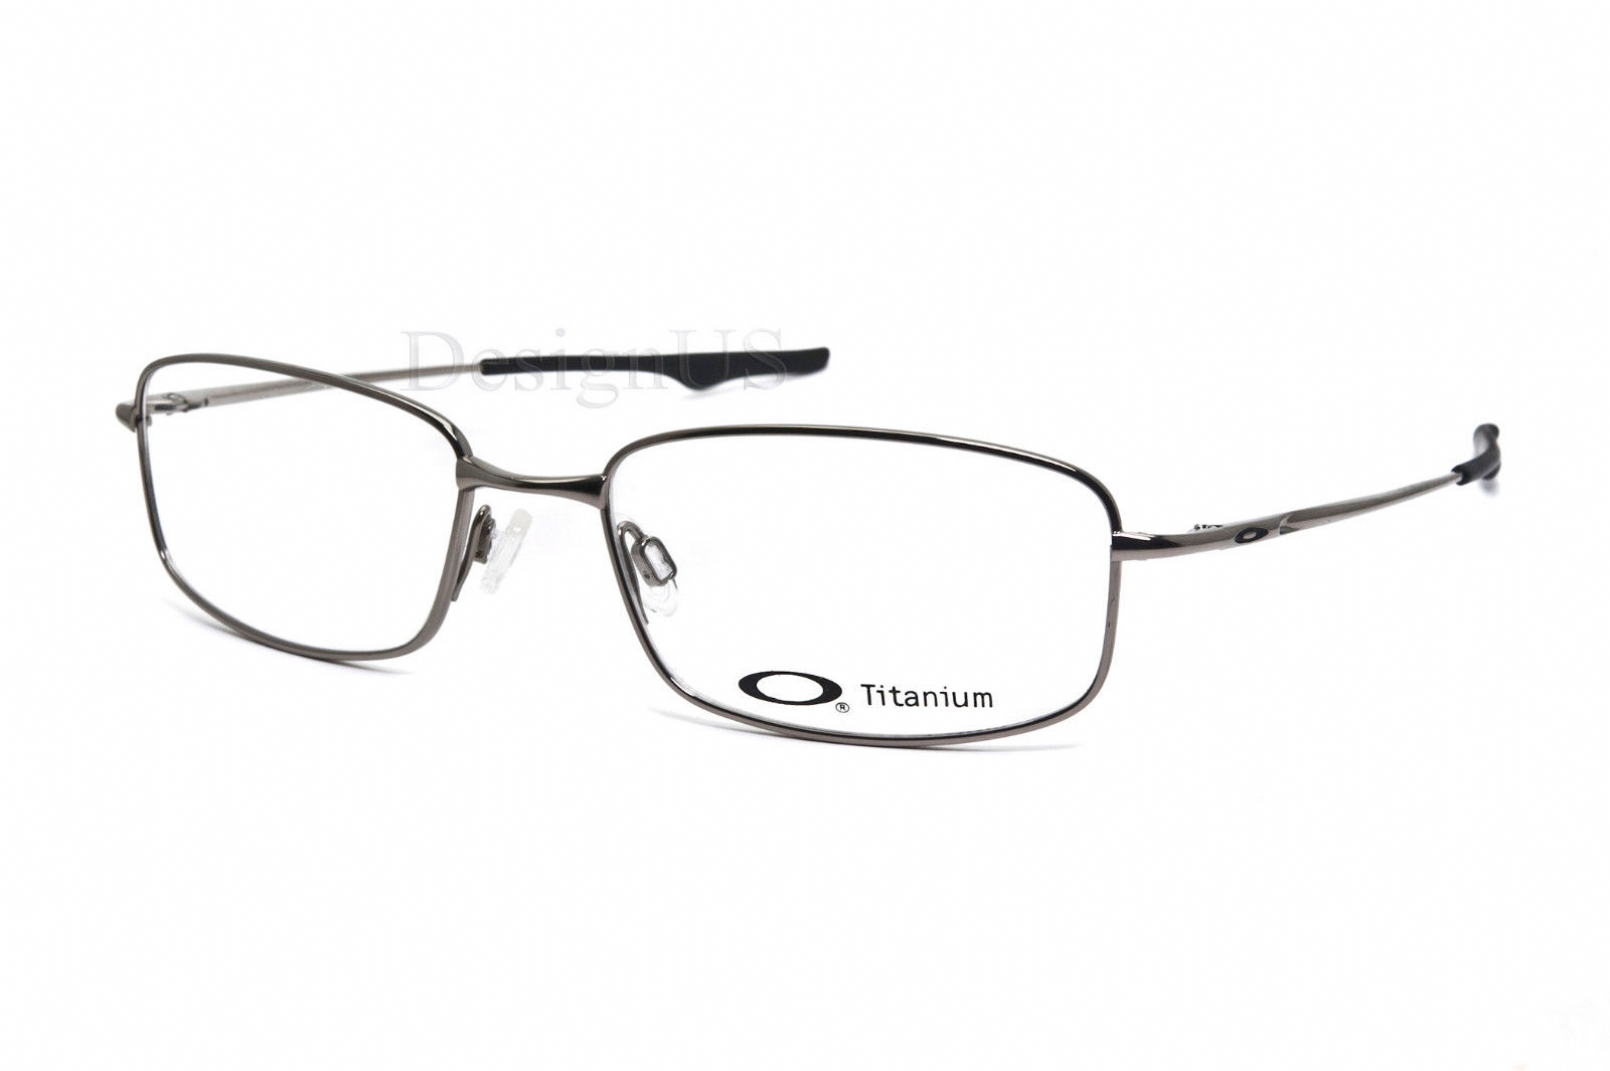 54a81f0a12 Oakley Keel Eyeglasses